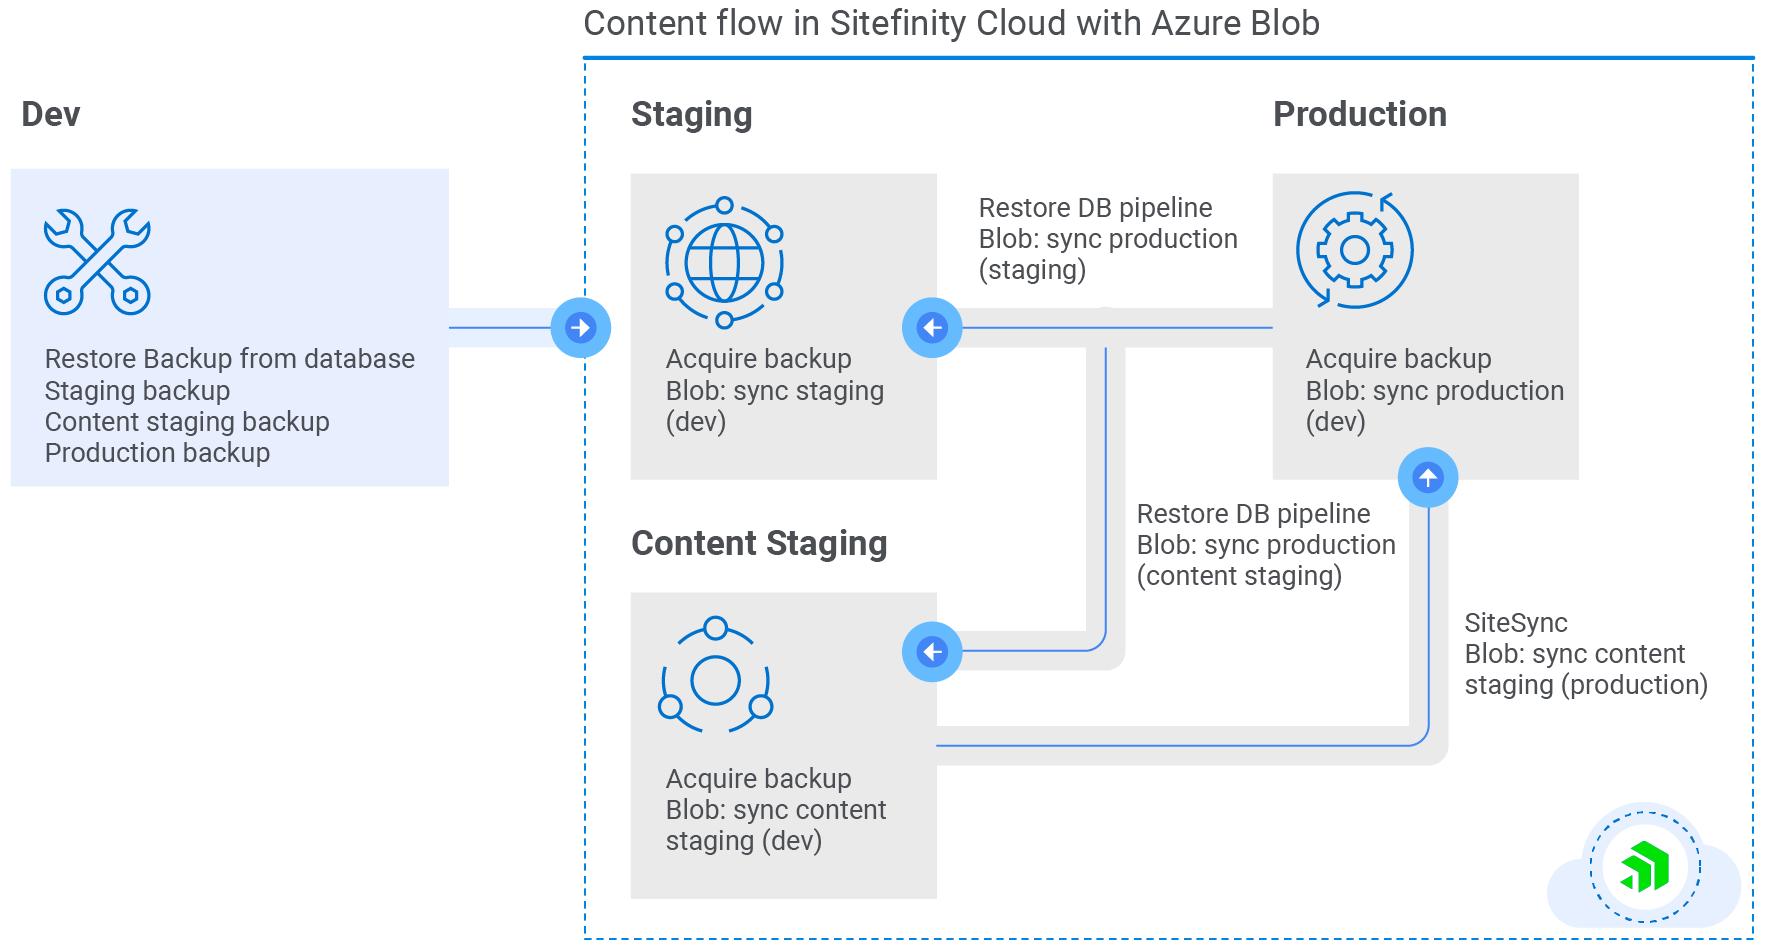 Sitefinity Cloud Blob Storage Diagram